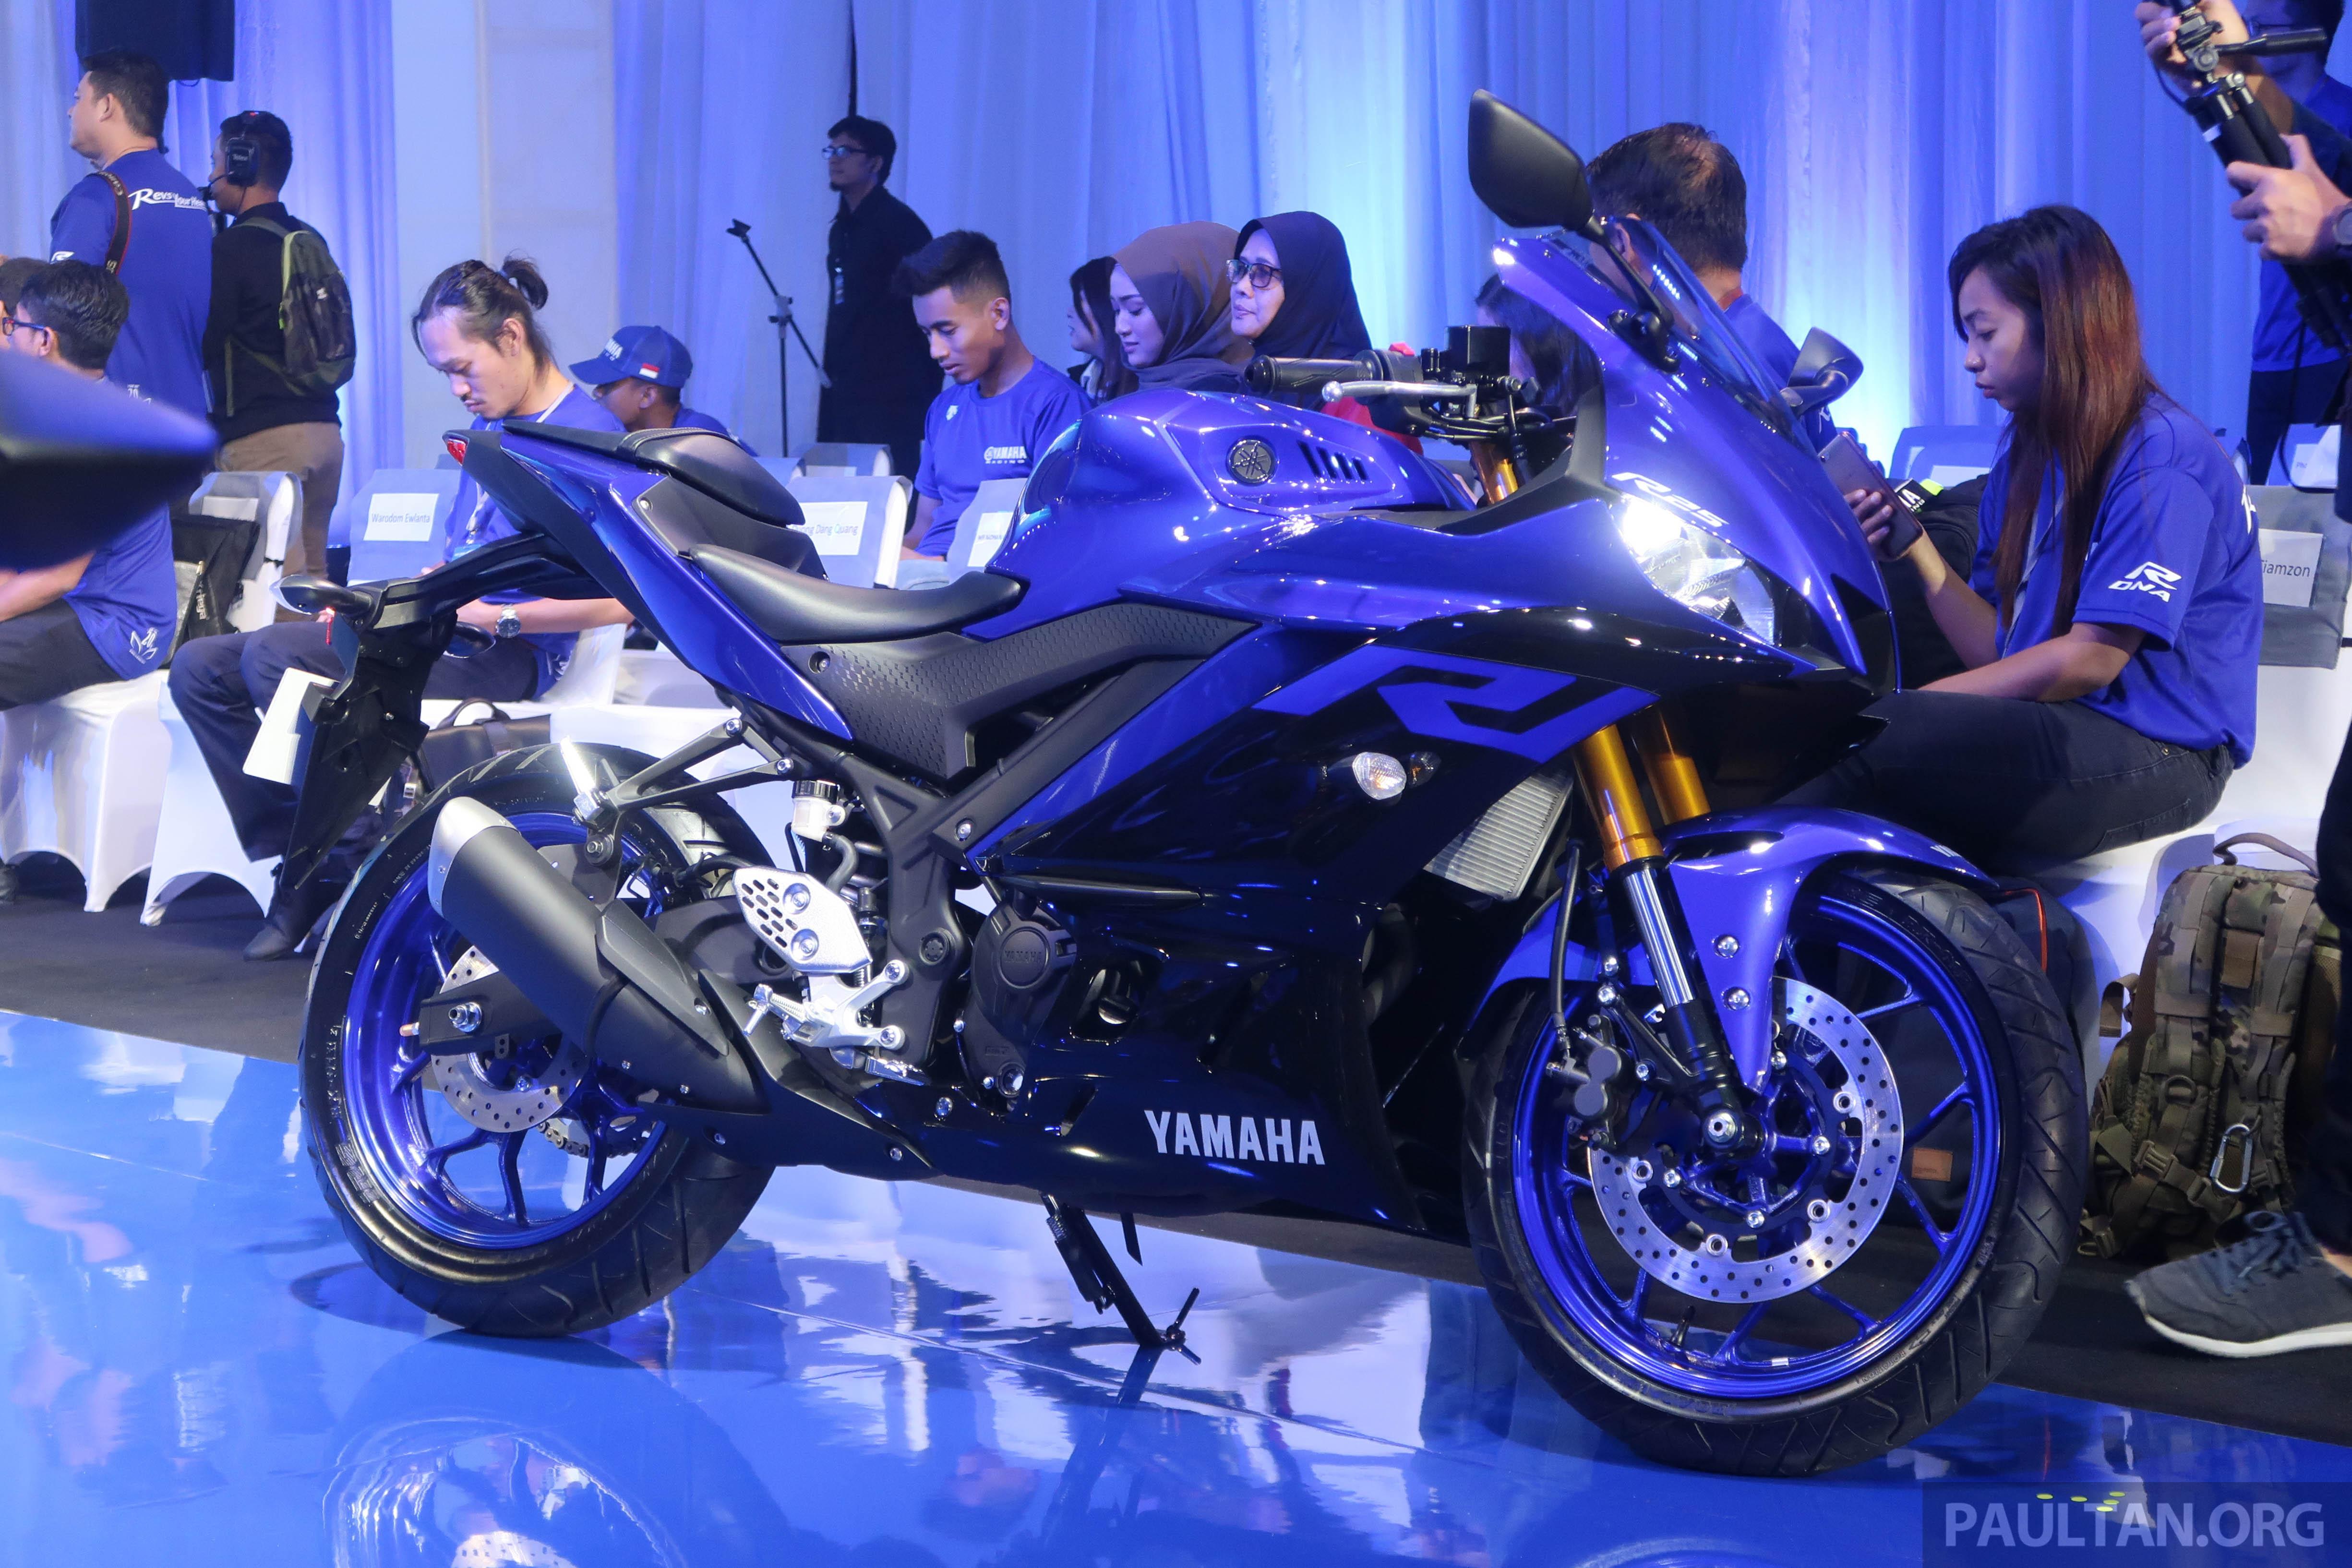 2019 Yamaha YZF-R25 world premiere - 8 km/h faster